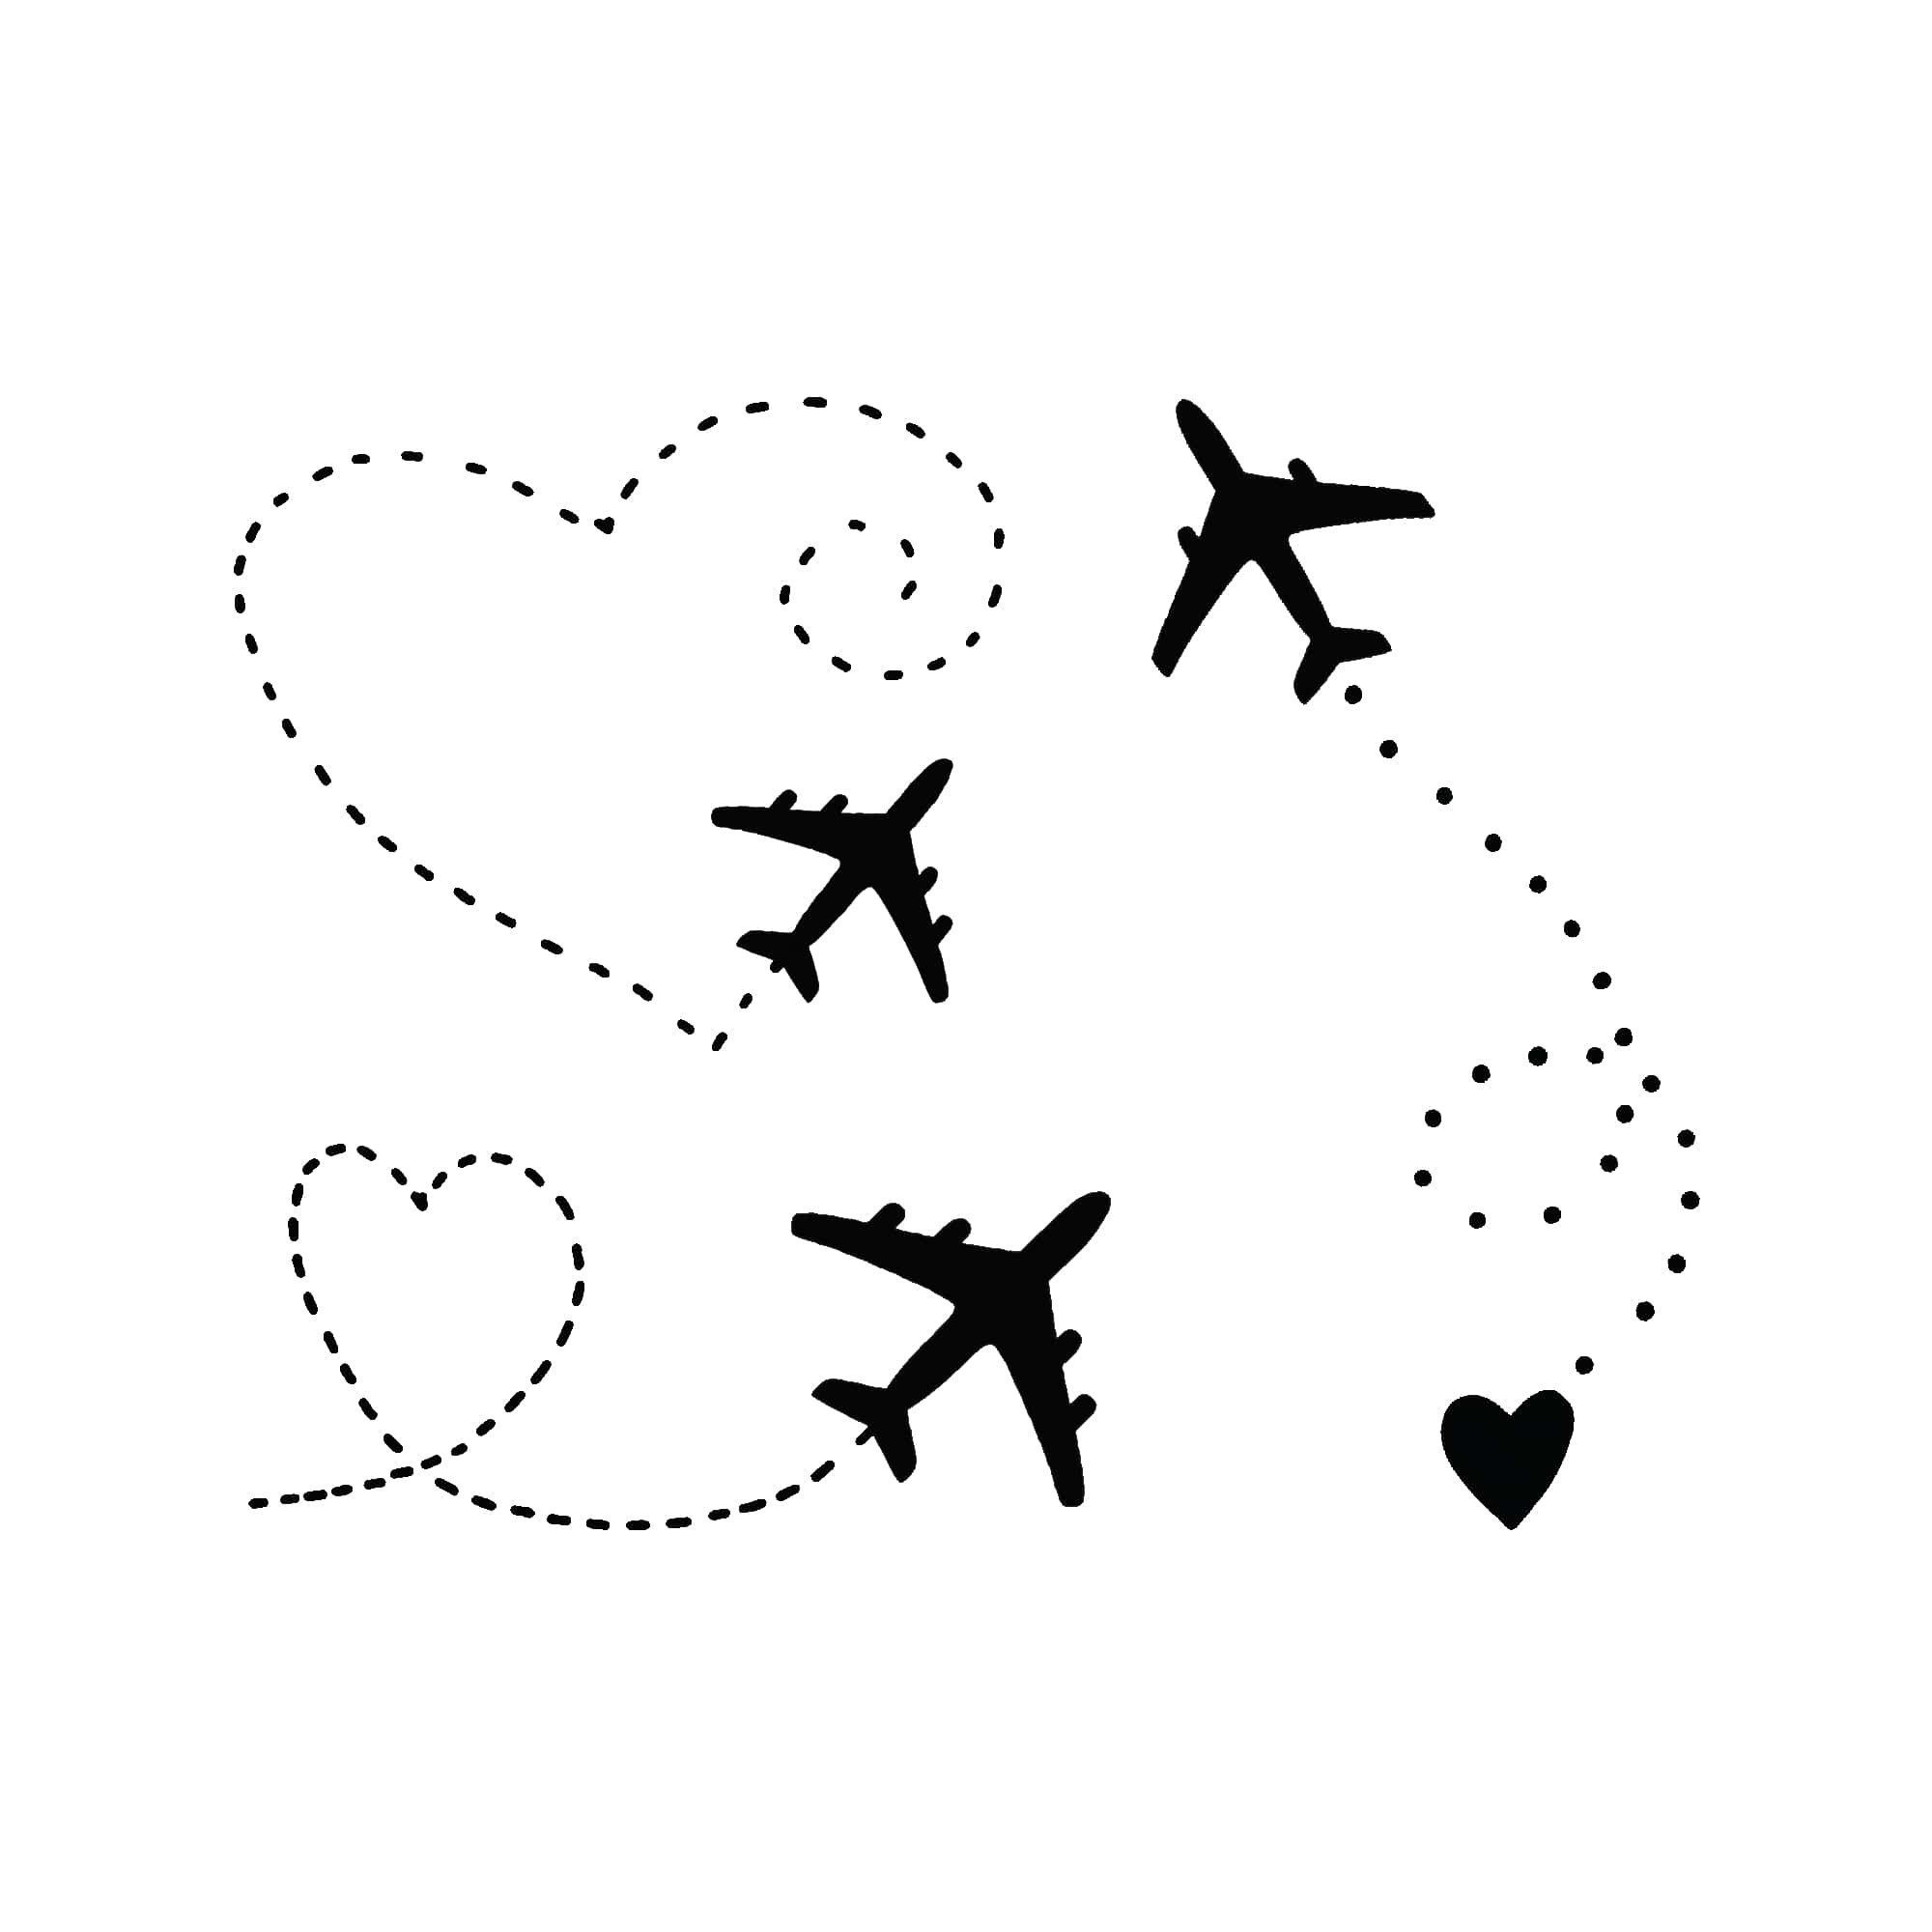 Avion tatouage / Black Heart Tattoo / tatouage temporaire avions / aventure vacances tatouage pour Couple / petit tatouage poignet / cadeau de bas #soappackaging